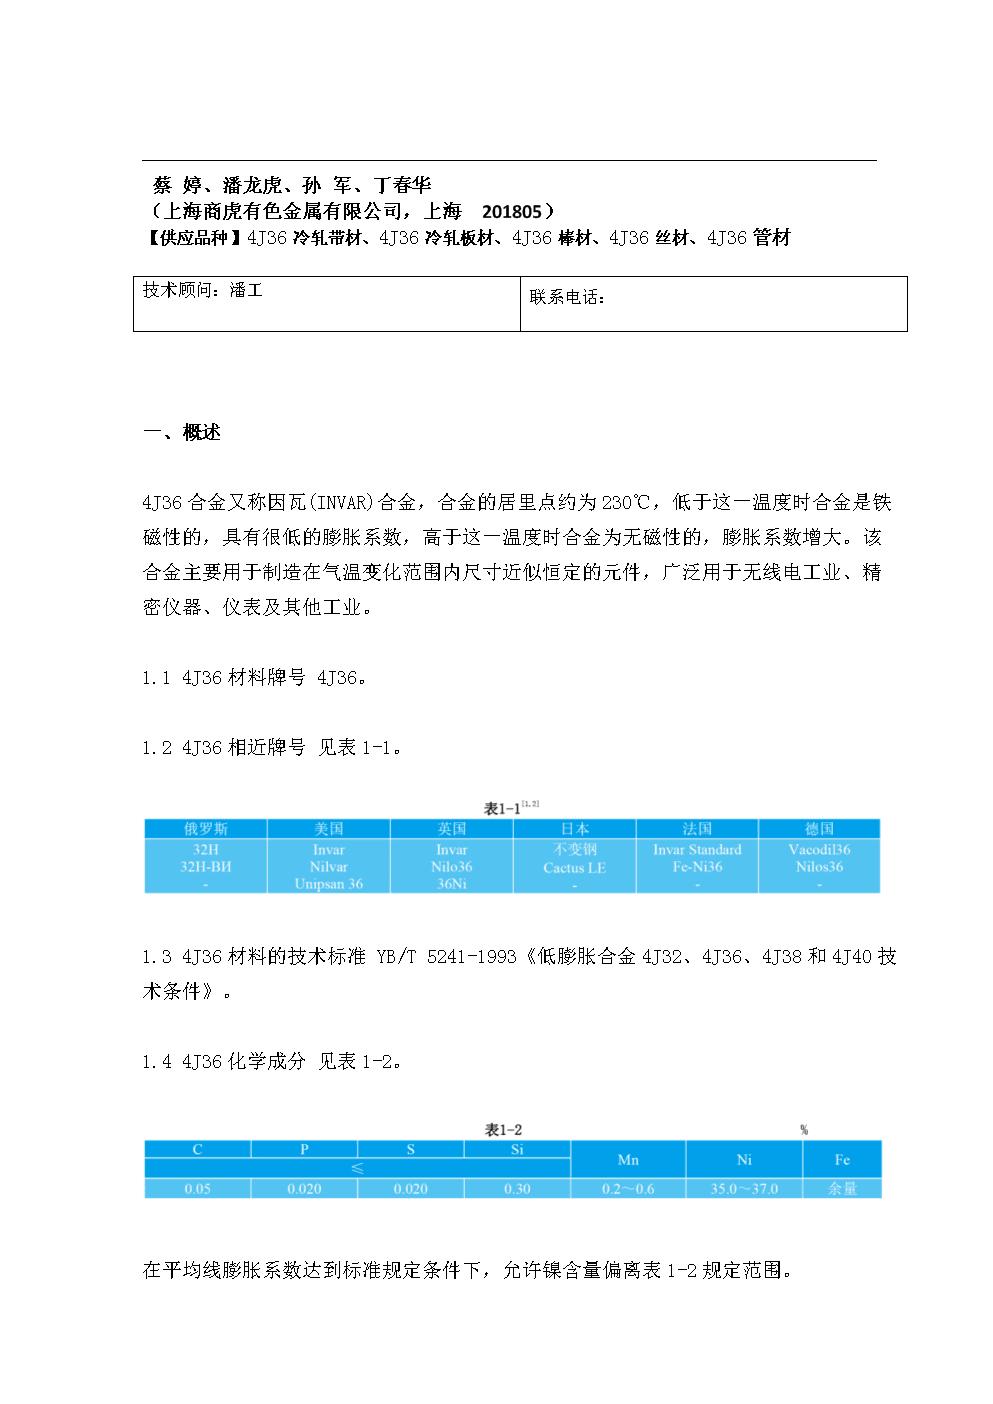 4J36(INVAR)因瓦合金-上海商虎合金技术.doc